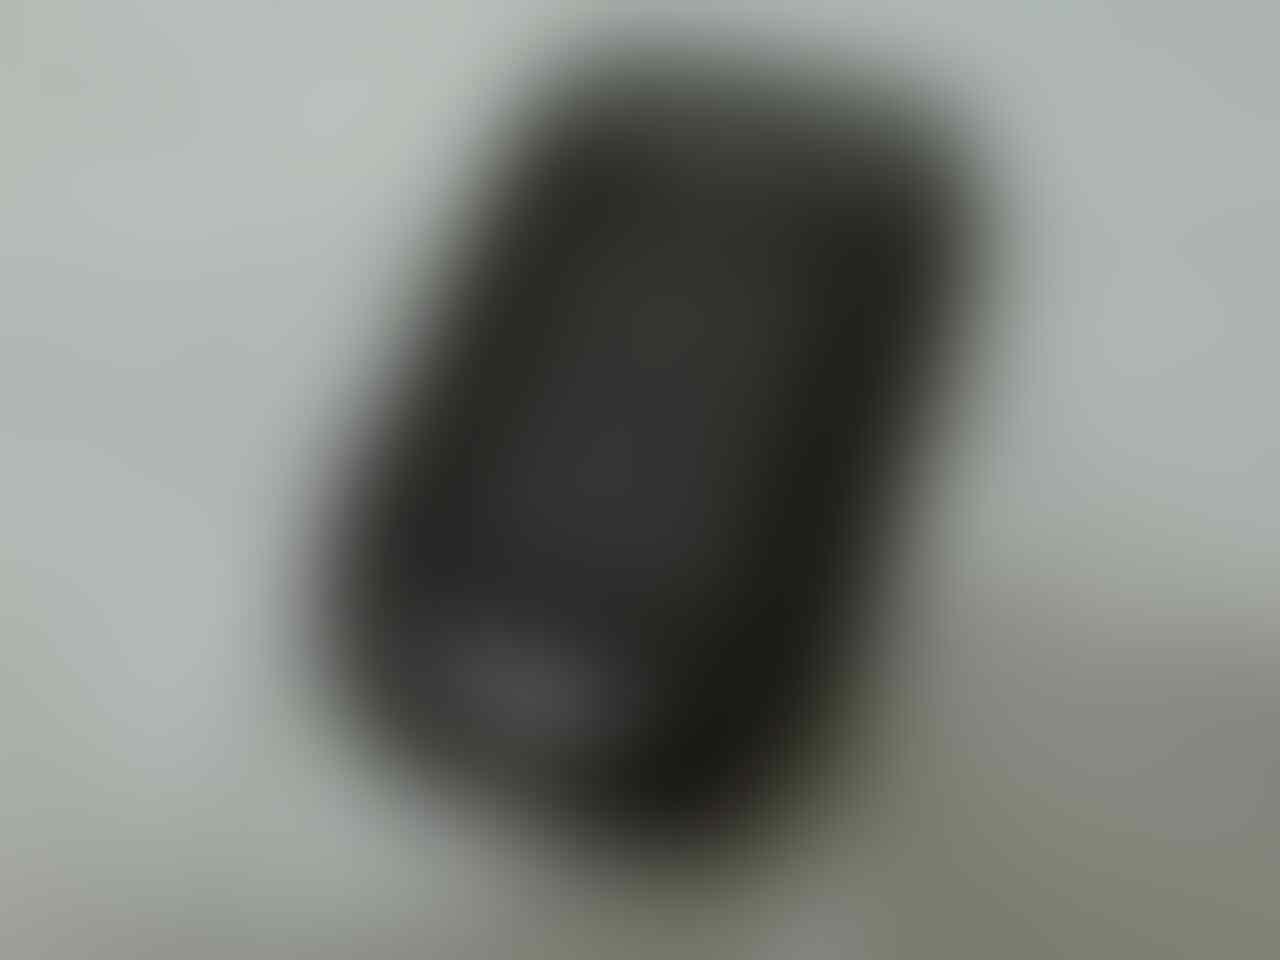 blackberry Style 9670 cdma black GRESSS